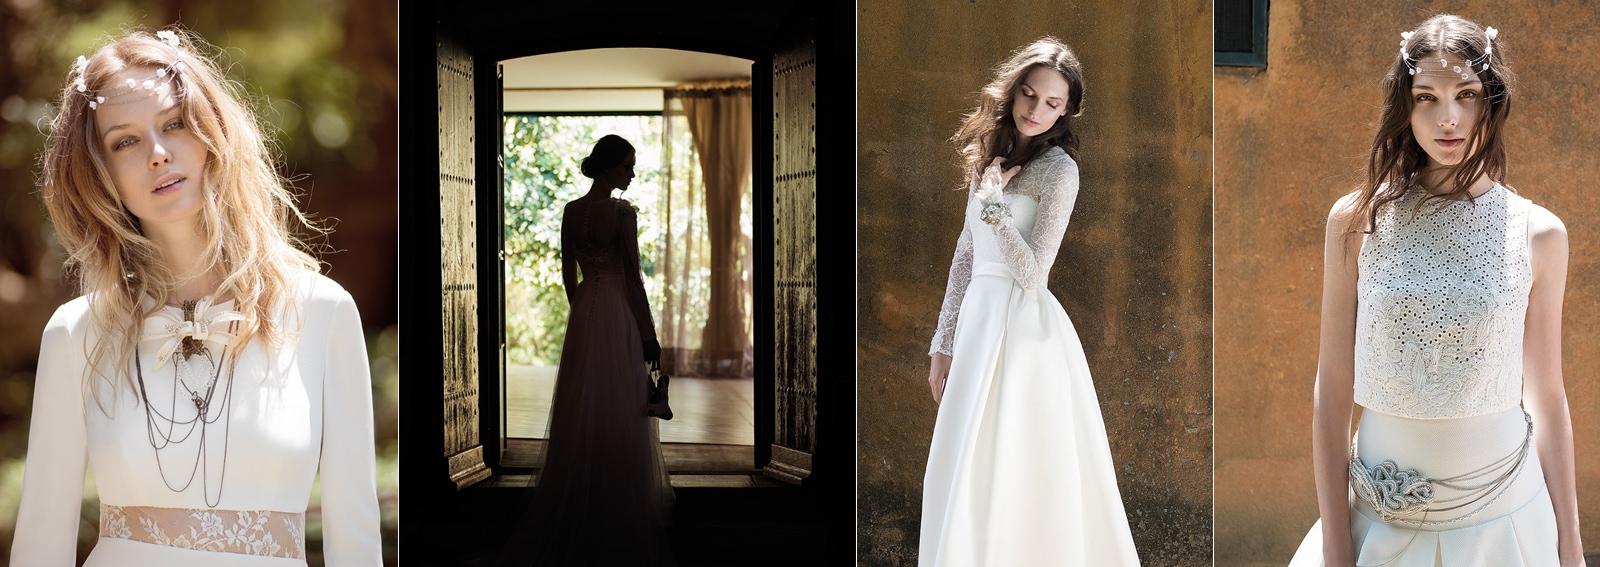 COVER-sposa-jesus-peiro-nanda-devi-DESKTOP